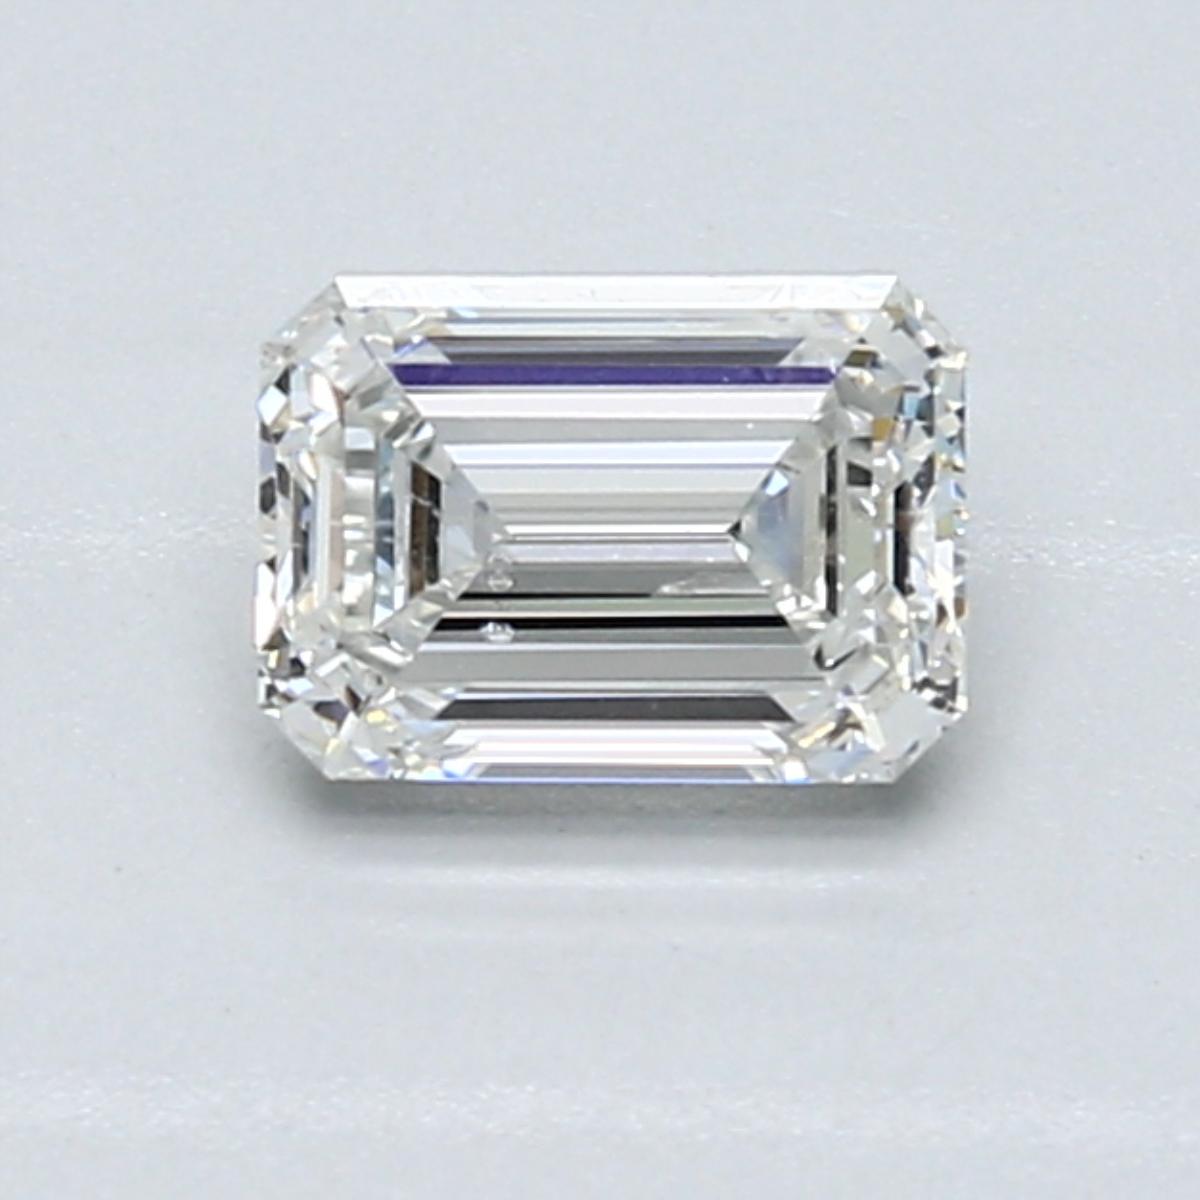 0.9 EC Diamond (G, SI2)